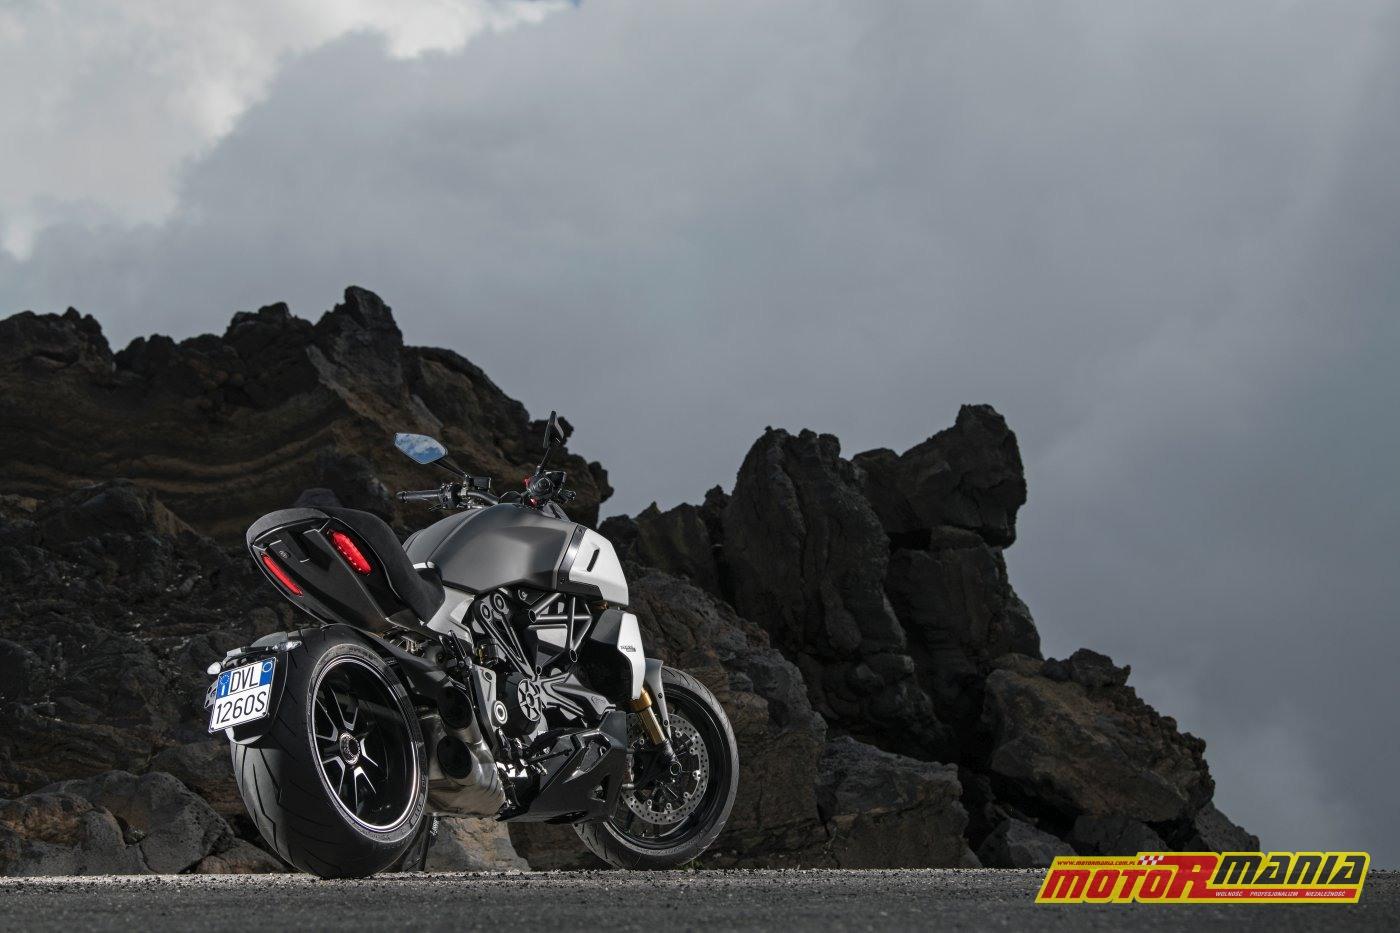 Ducati Diavel 1260 S 2019 (3)